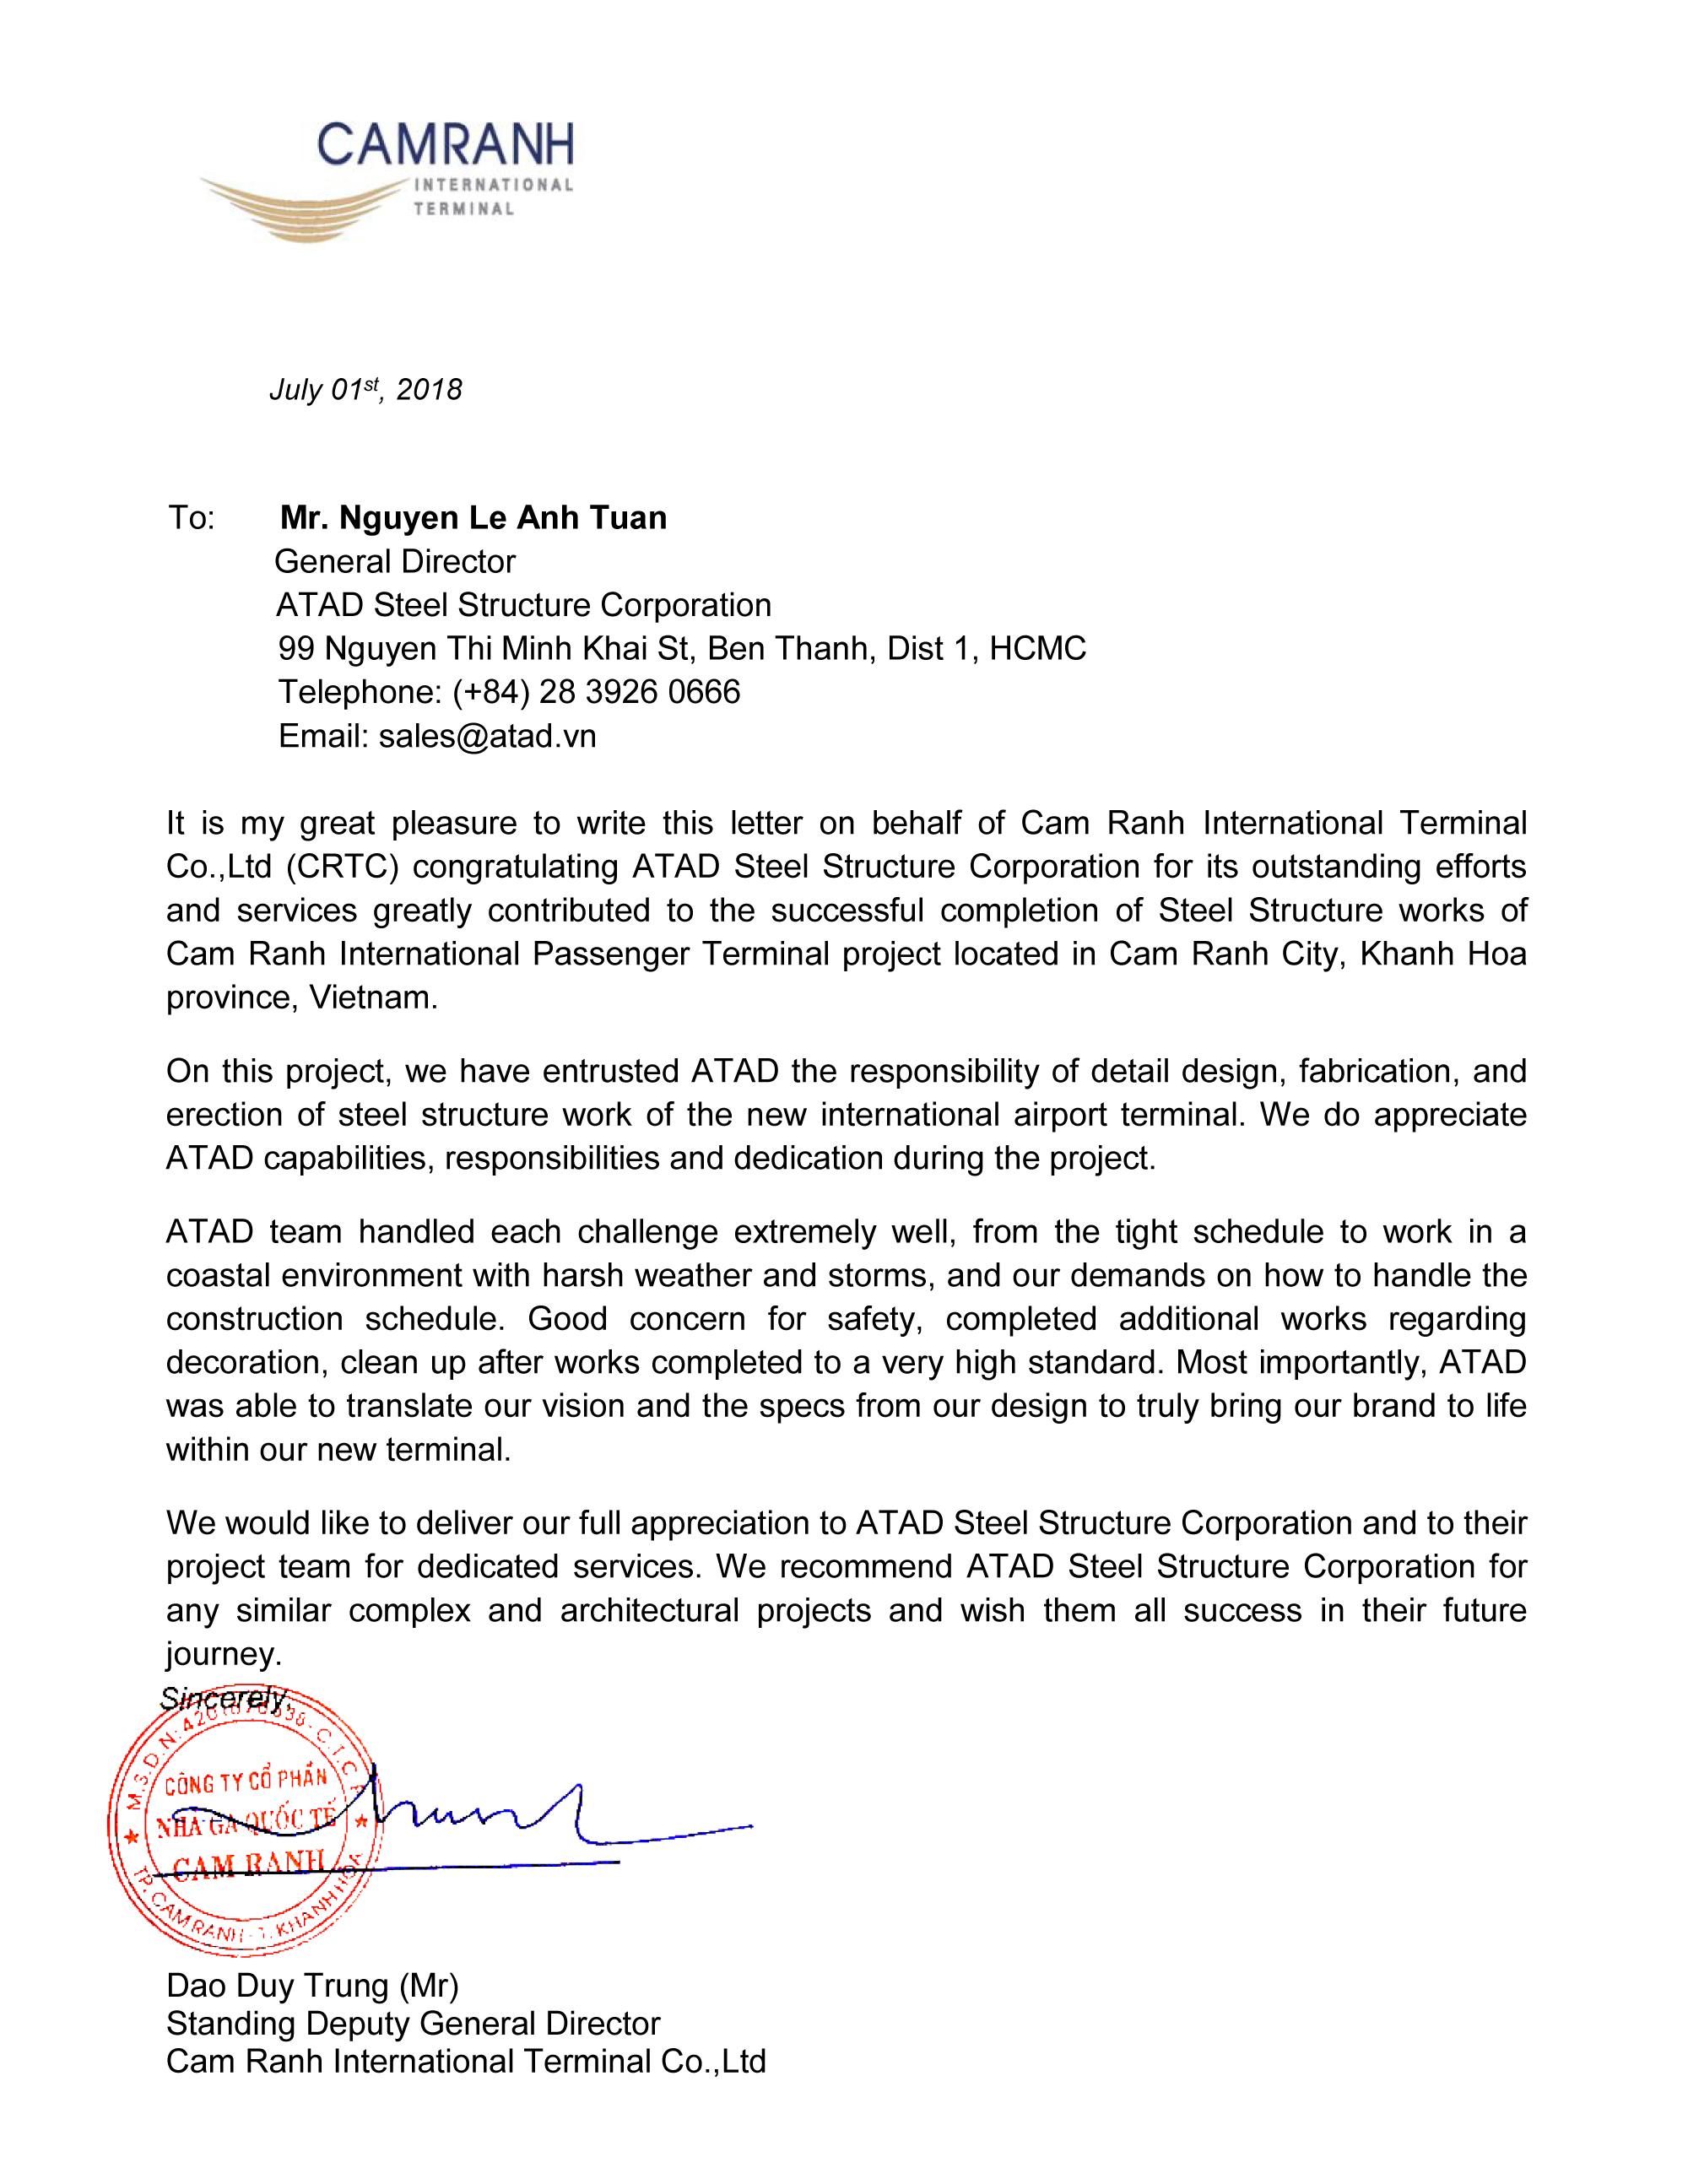 Cam Ranh Testimonial